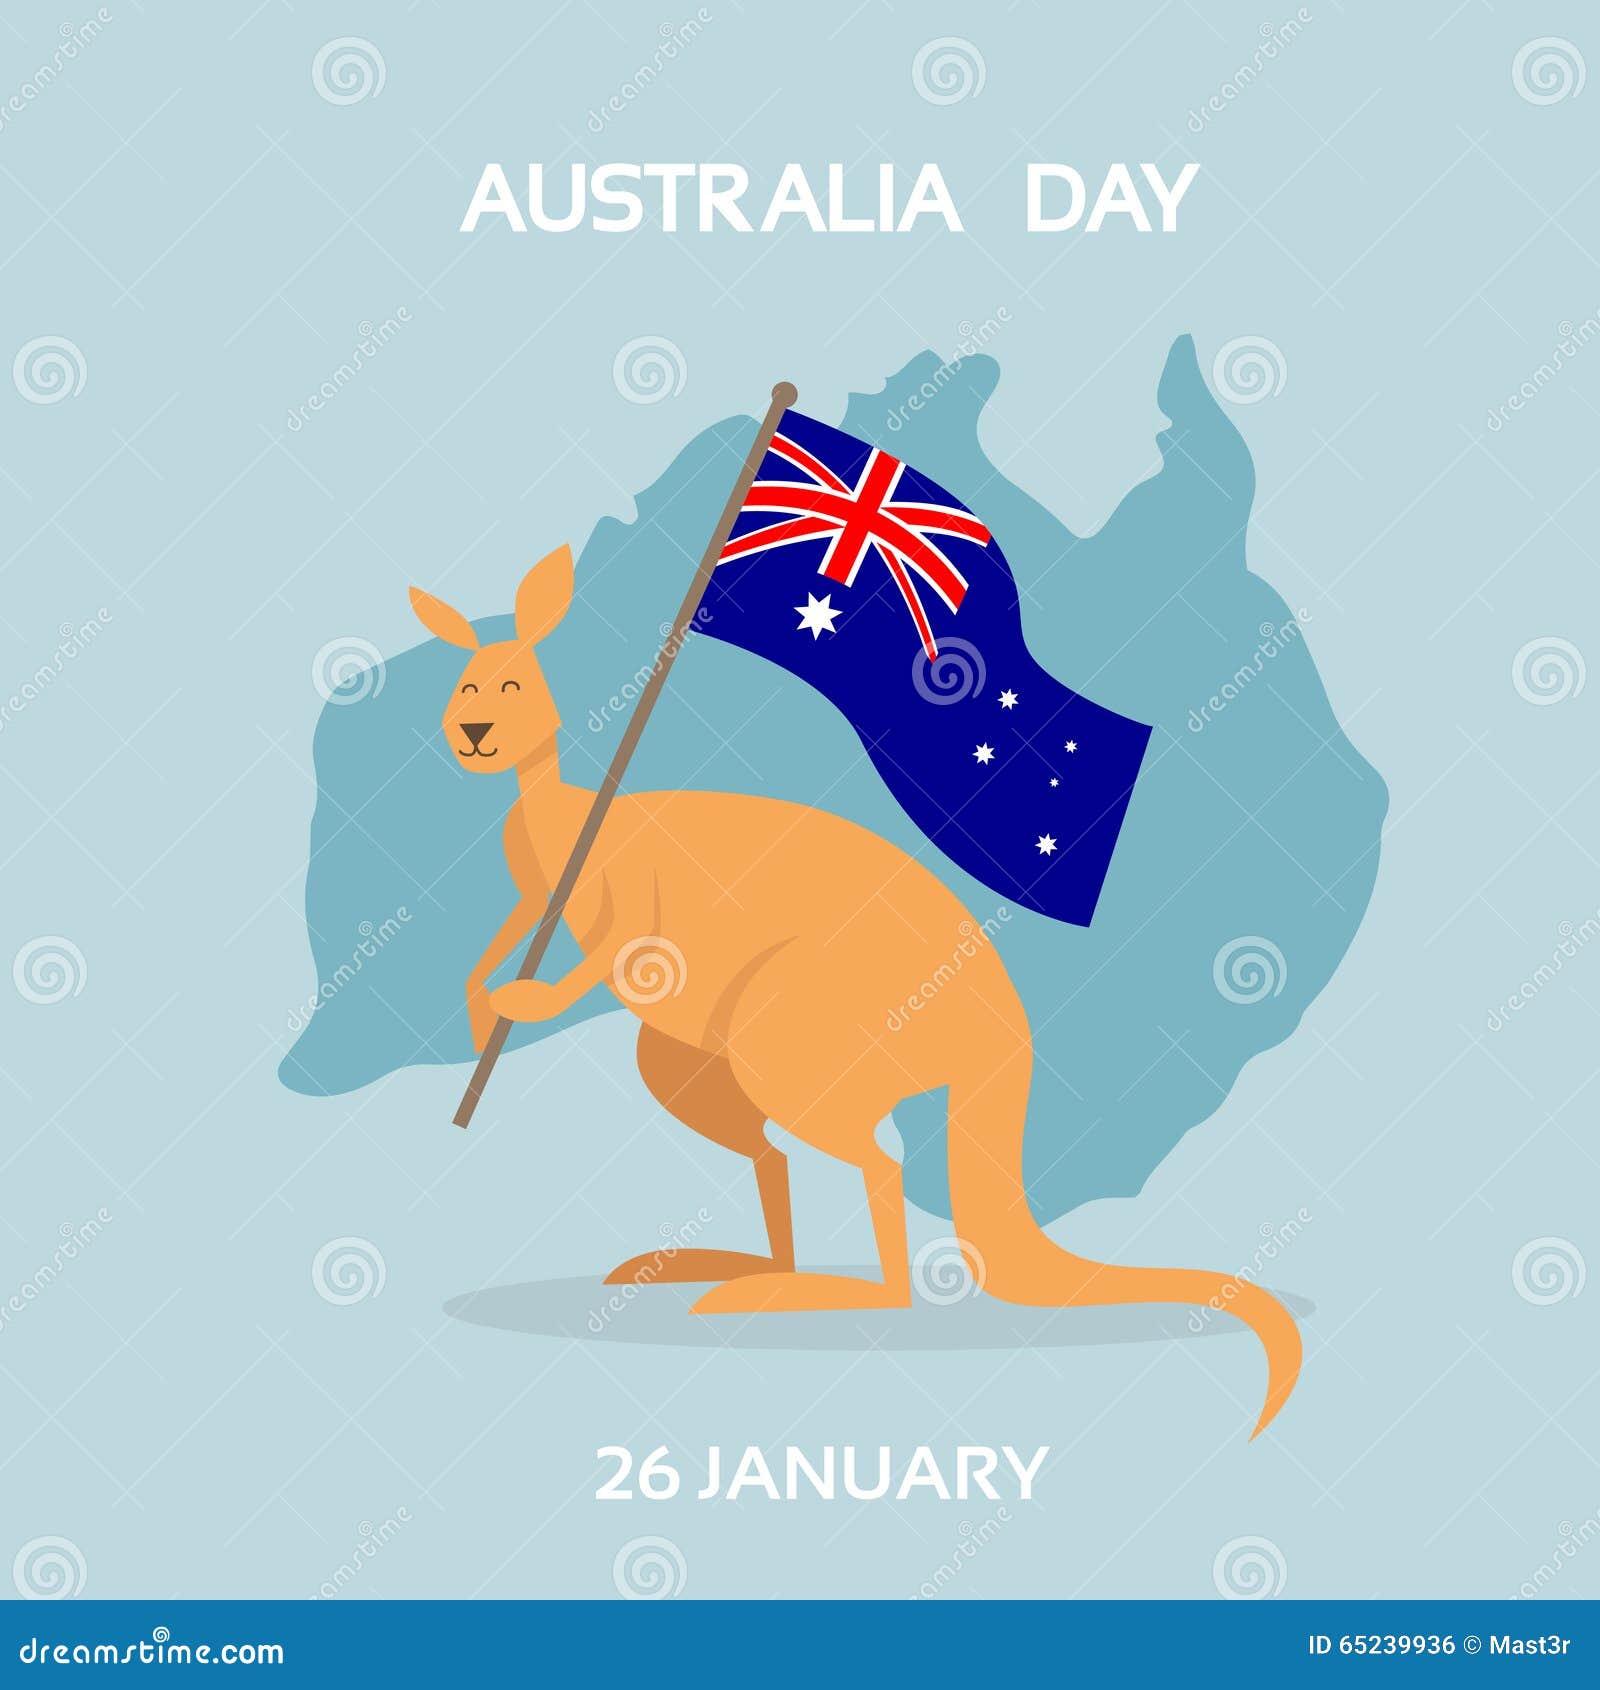 Australia Day Kangaroo Flag National Country Map Stock Vector - Australia map kangaroo